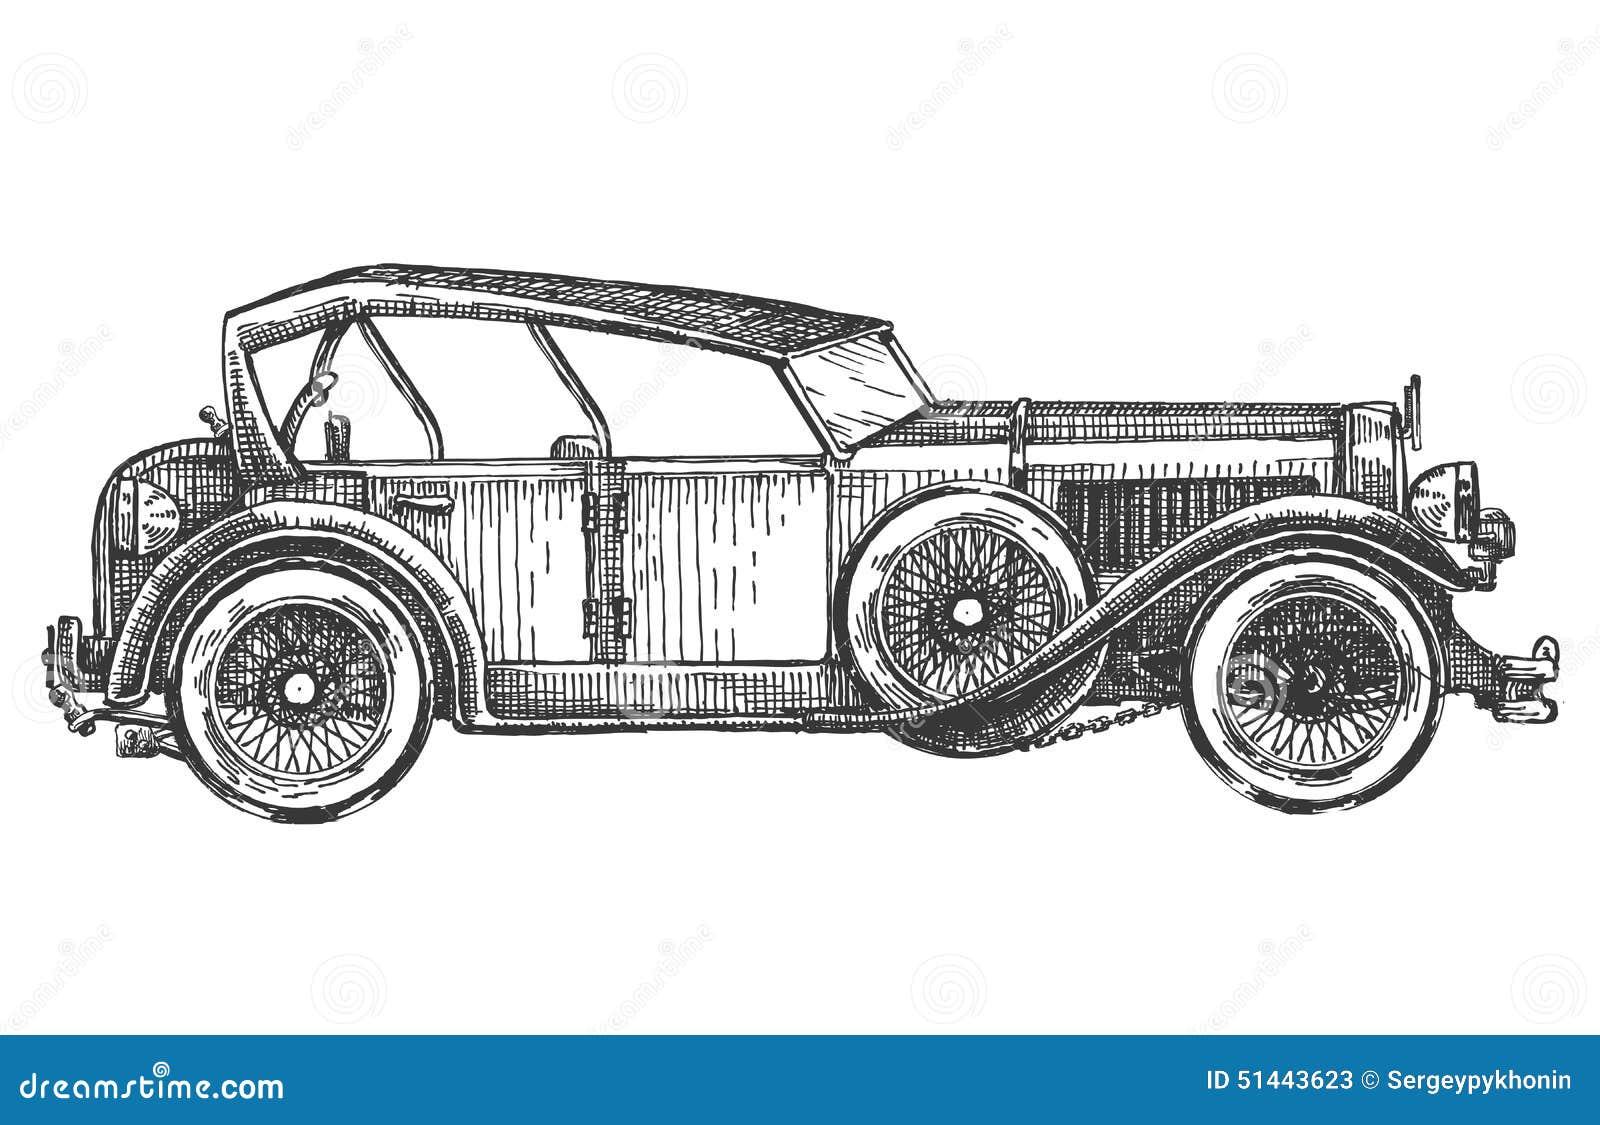 Vintage Car On A White Background. Sketch Stock Illustration ...